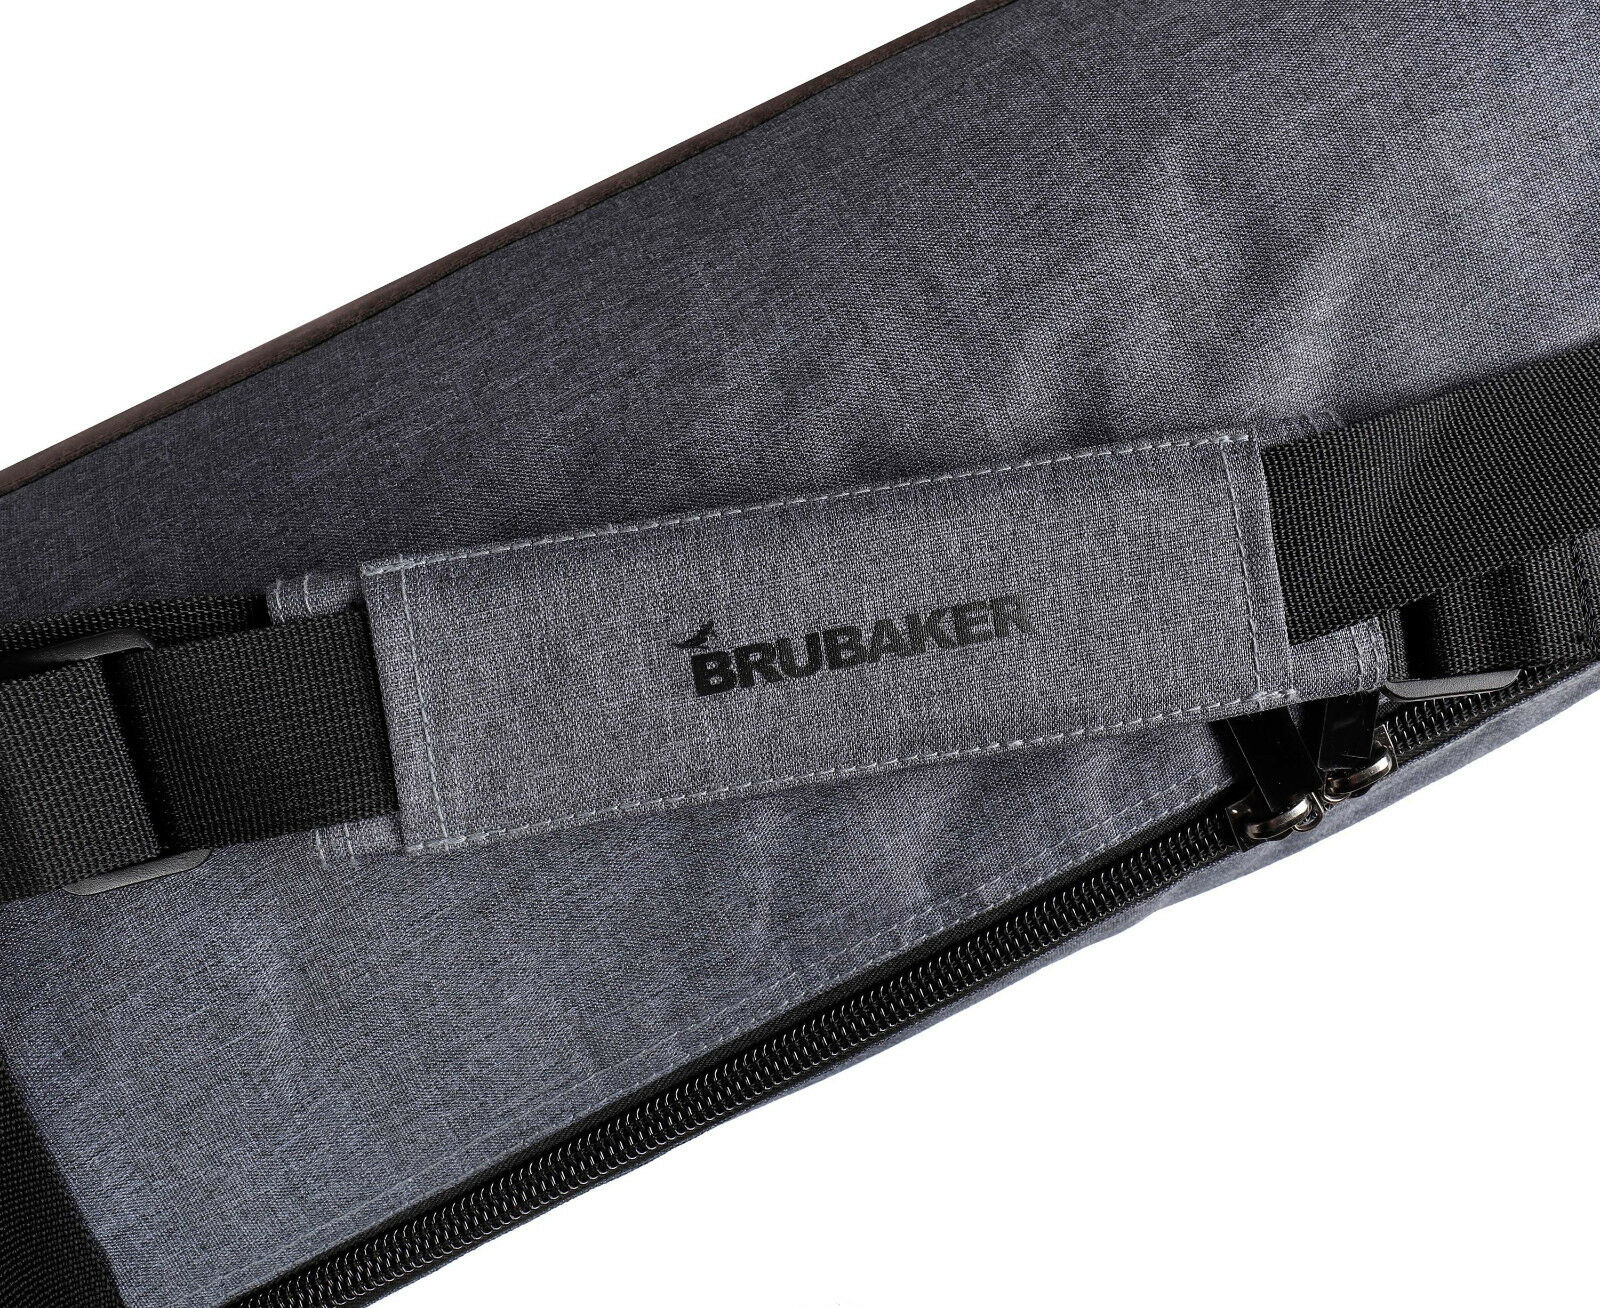 43 x 27 x 5 cm Unisex Black Crevice Ski Bag Set red//grey BCR151006